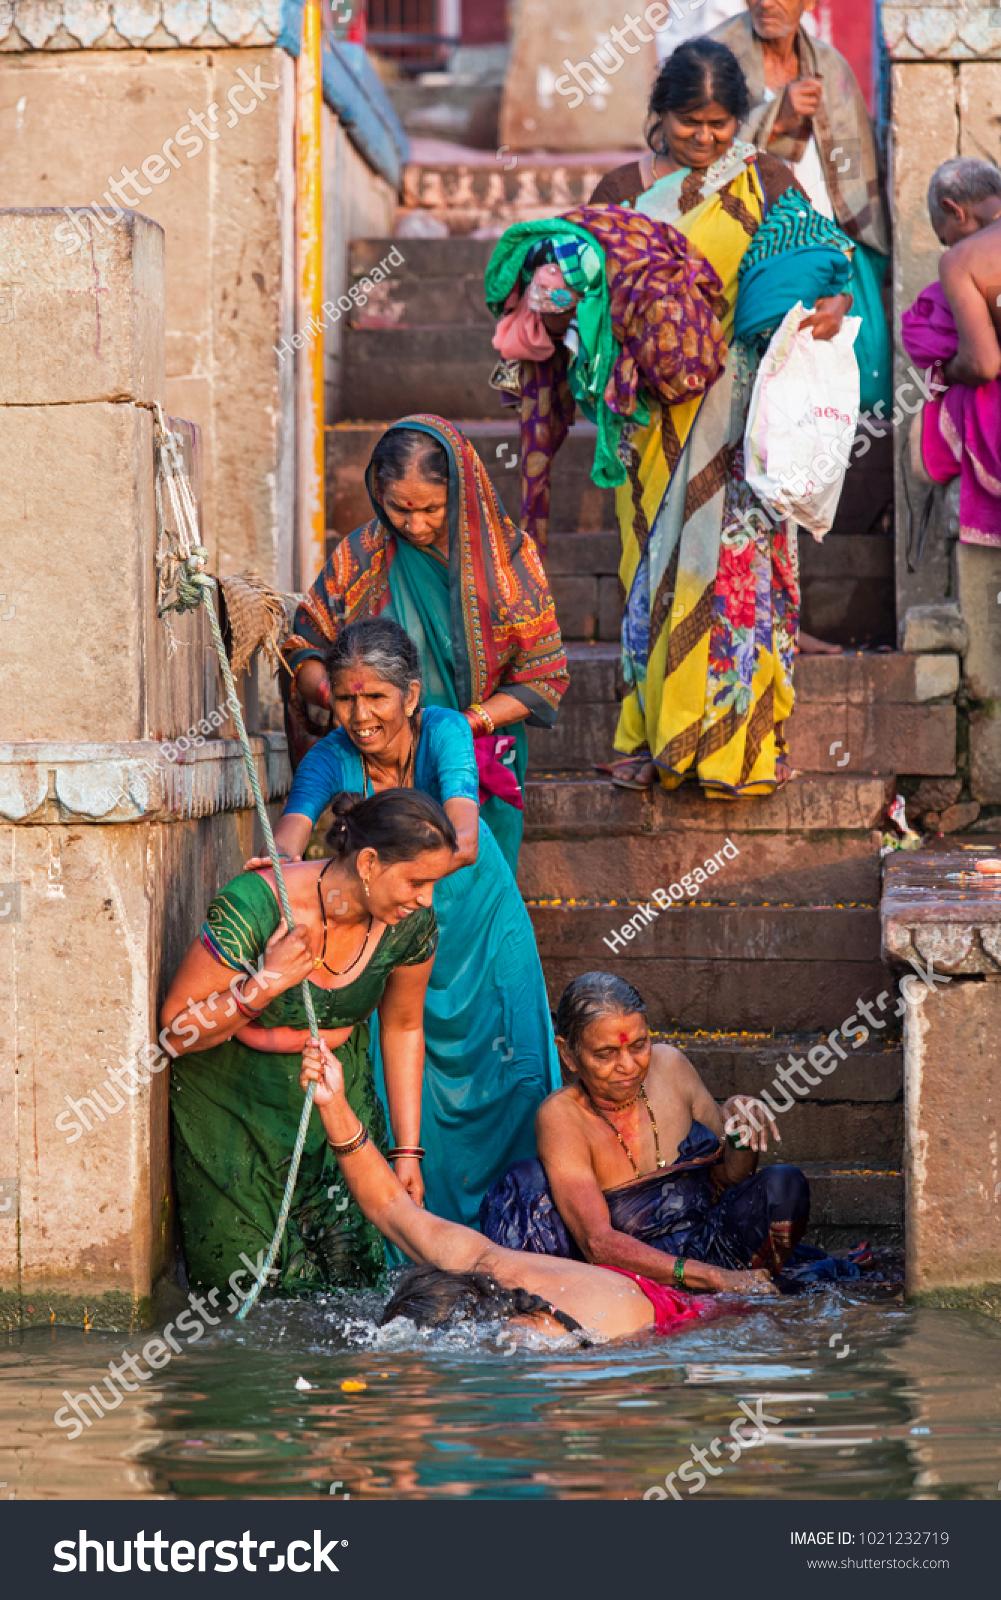 Varanasi, India - March 18, 2014 Unidentified Indian -6636